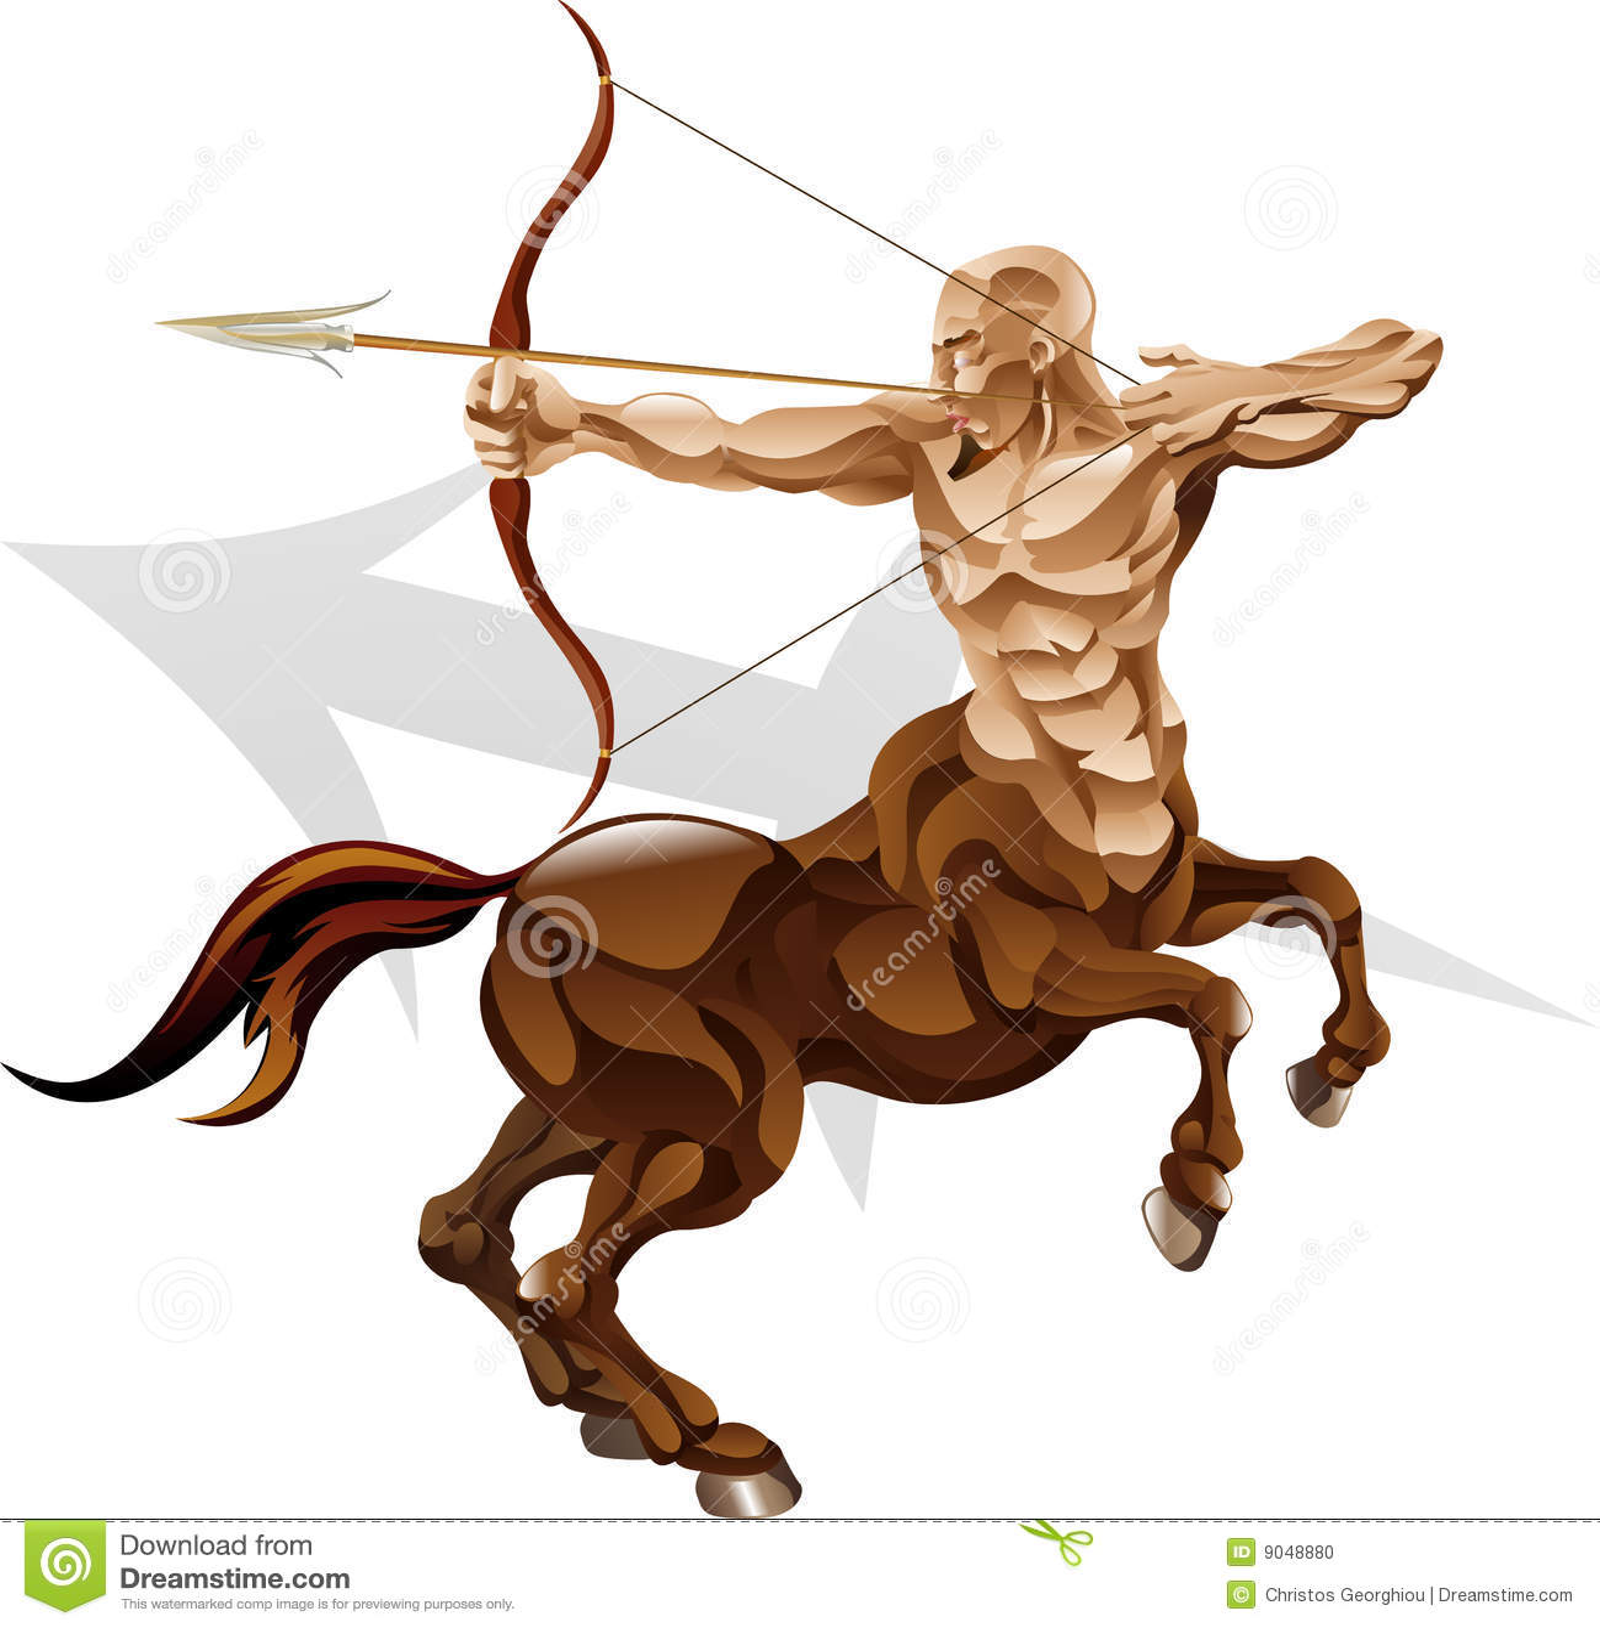 Sagittarius The Archer Star Sign Stock Vector - Illustration